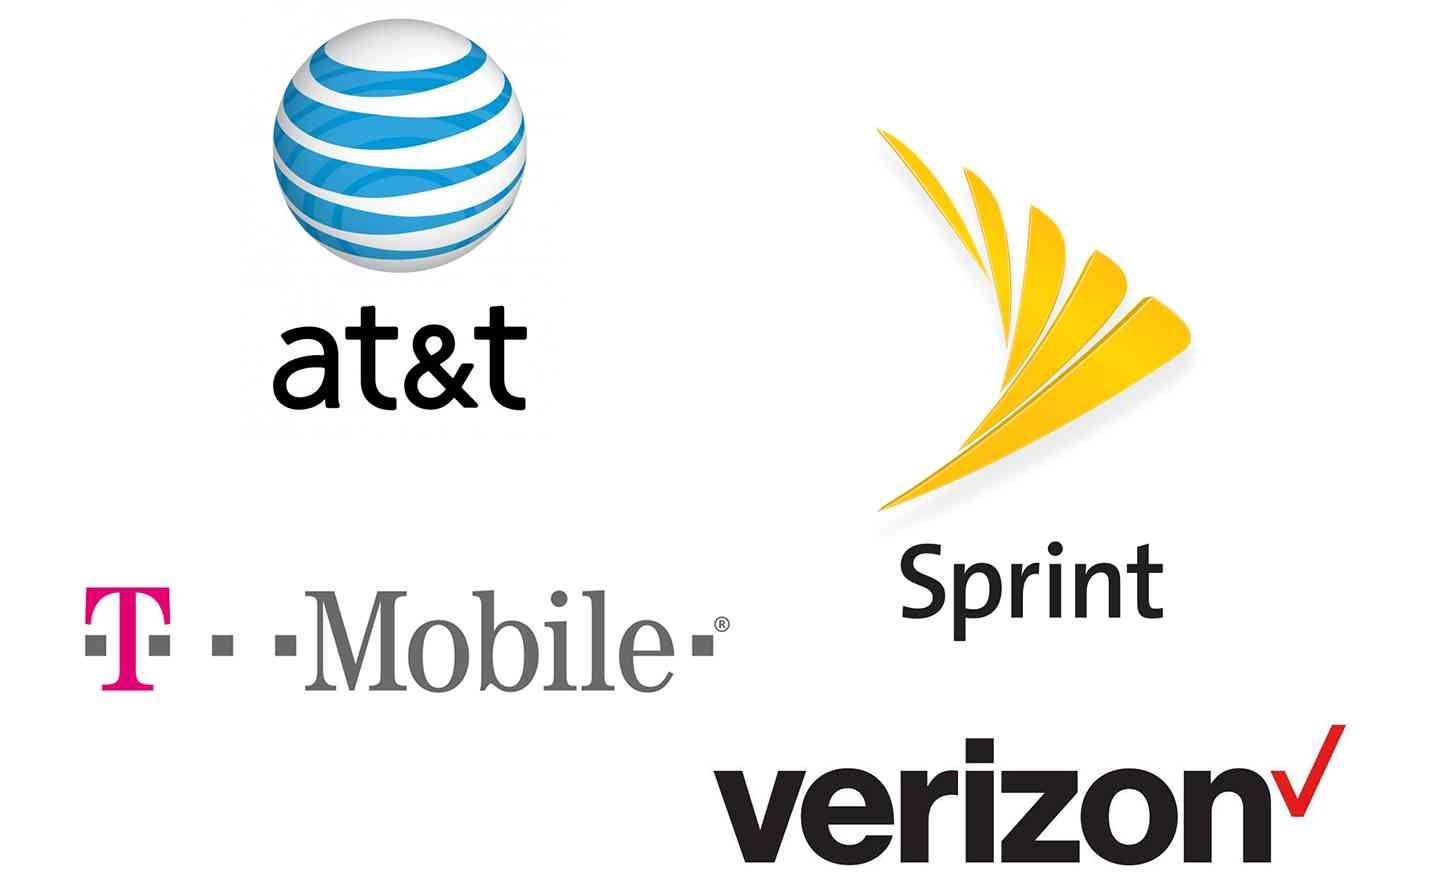 Big four U.S. carriers logos